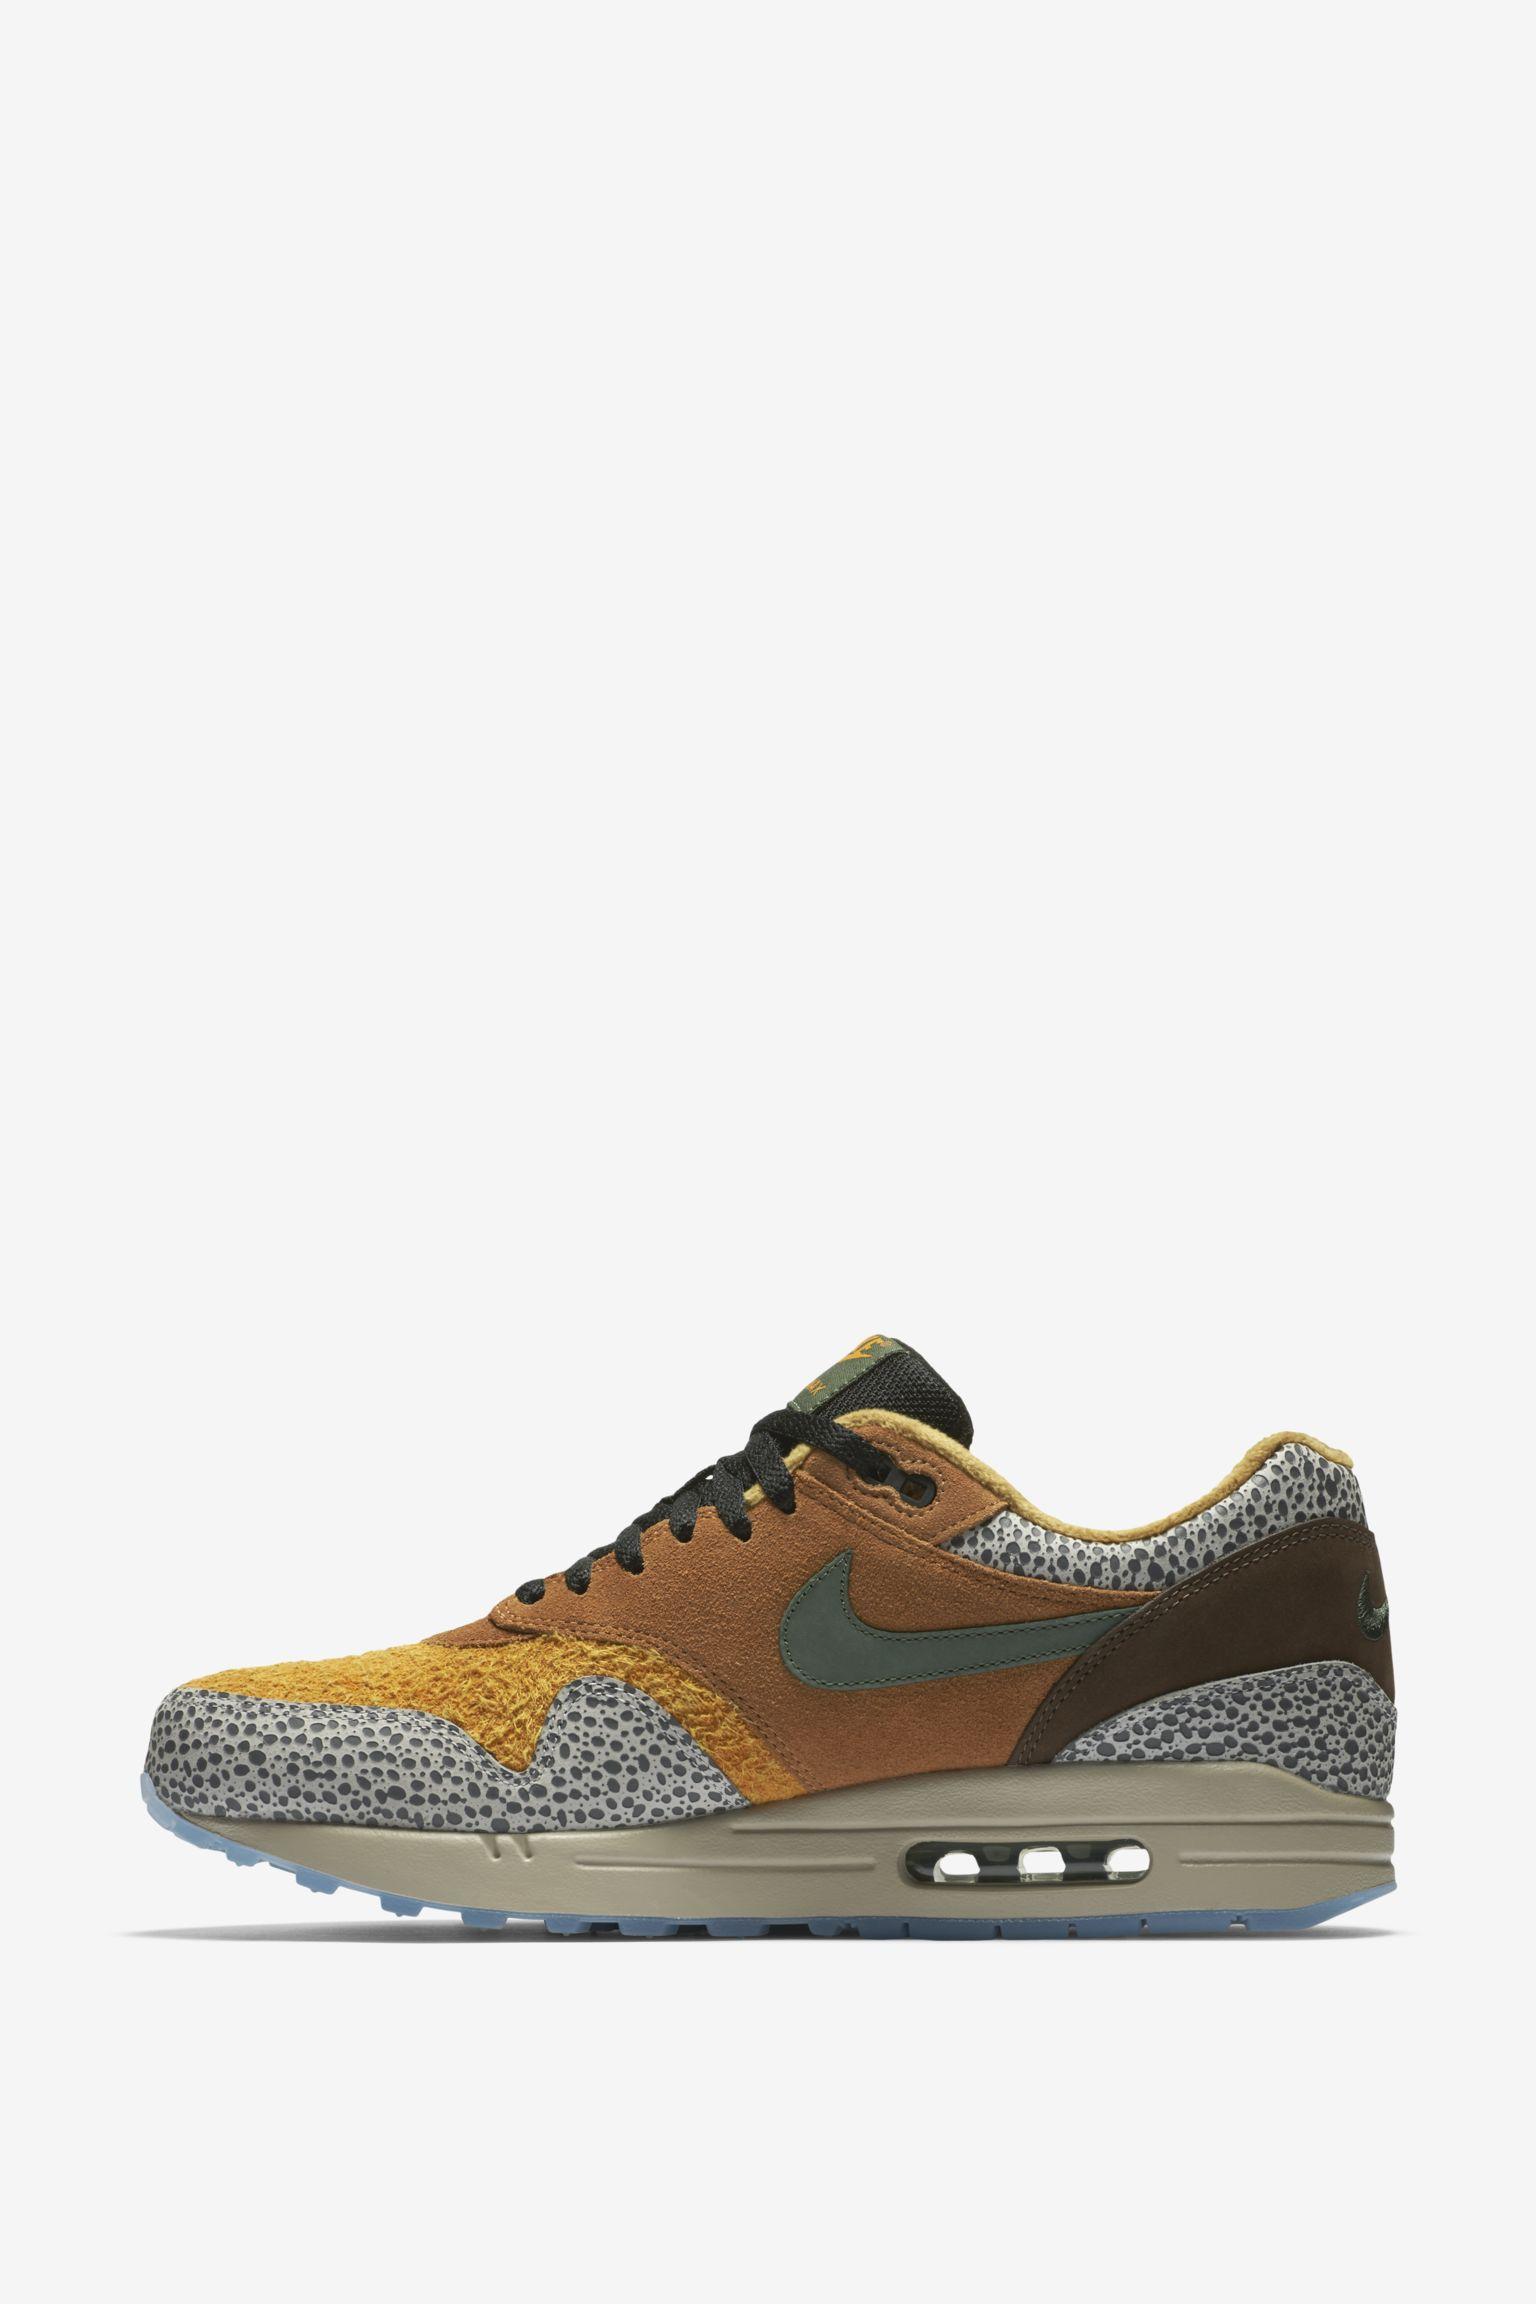 Nike Air Max 1 Premium Olive Canvas Mens Shoes Retro